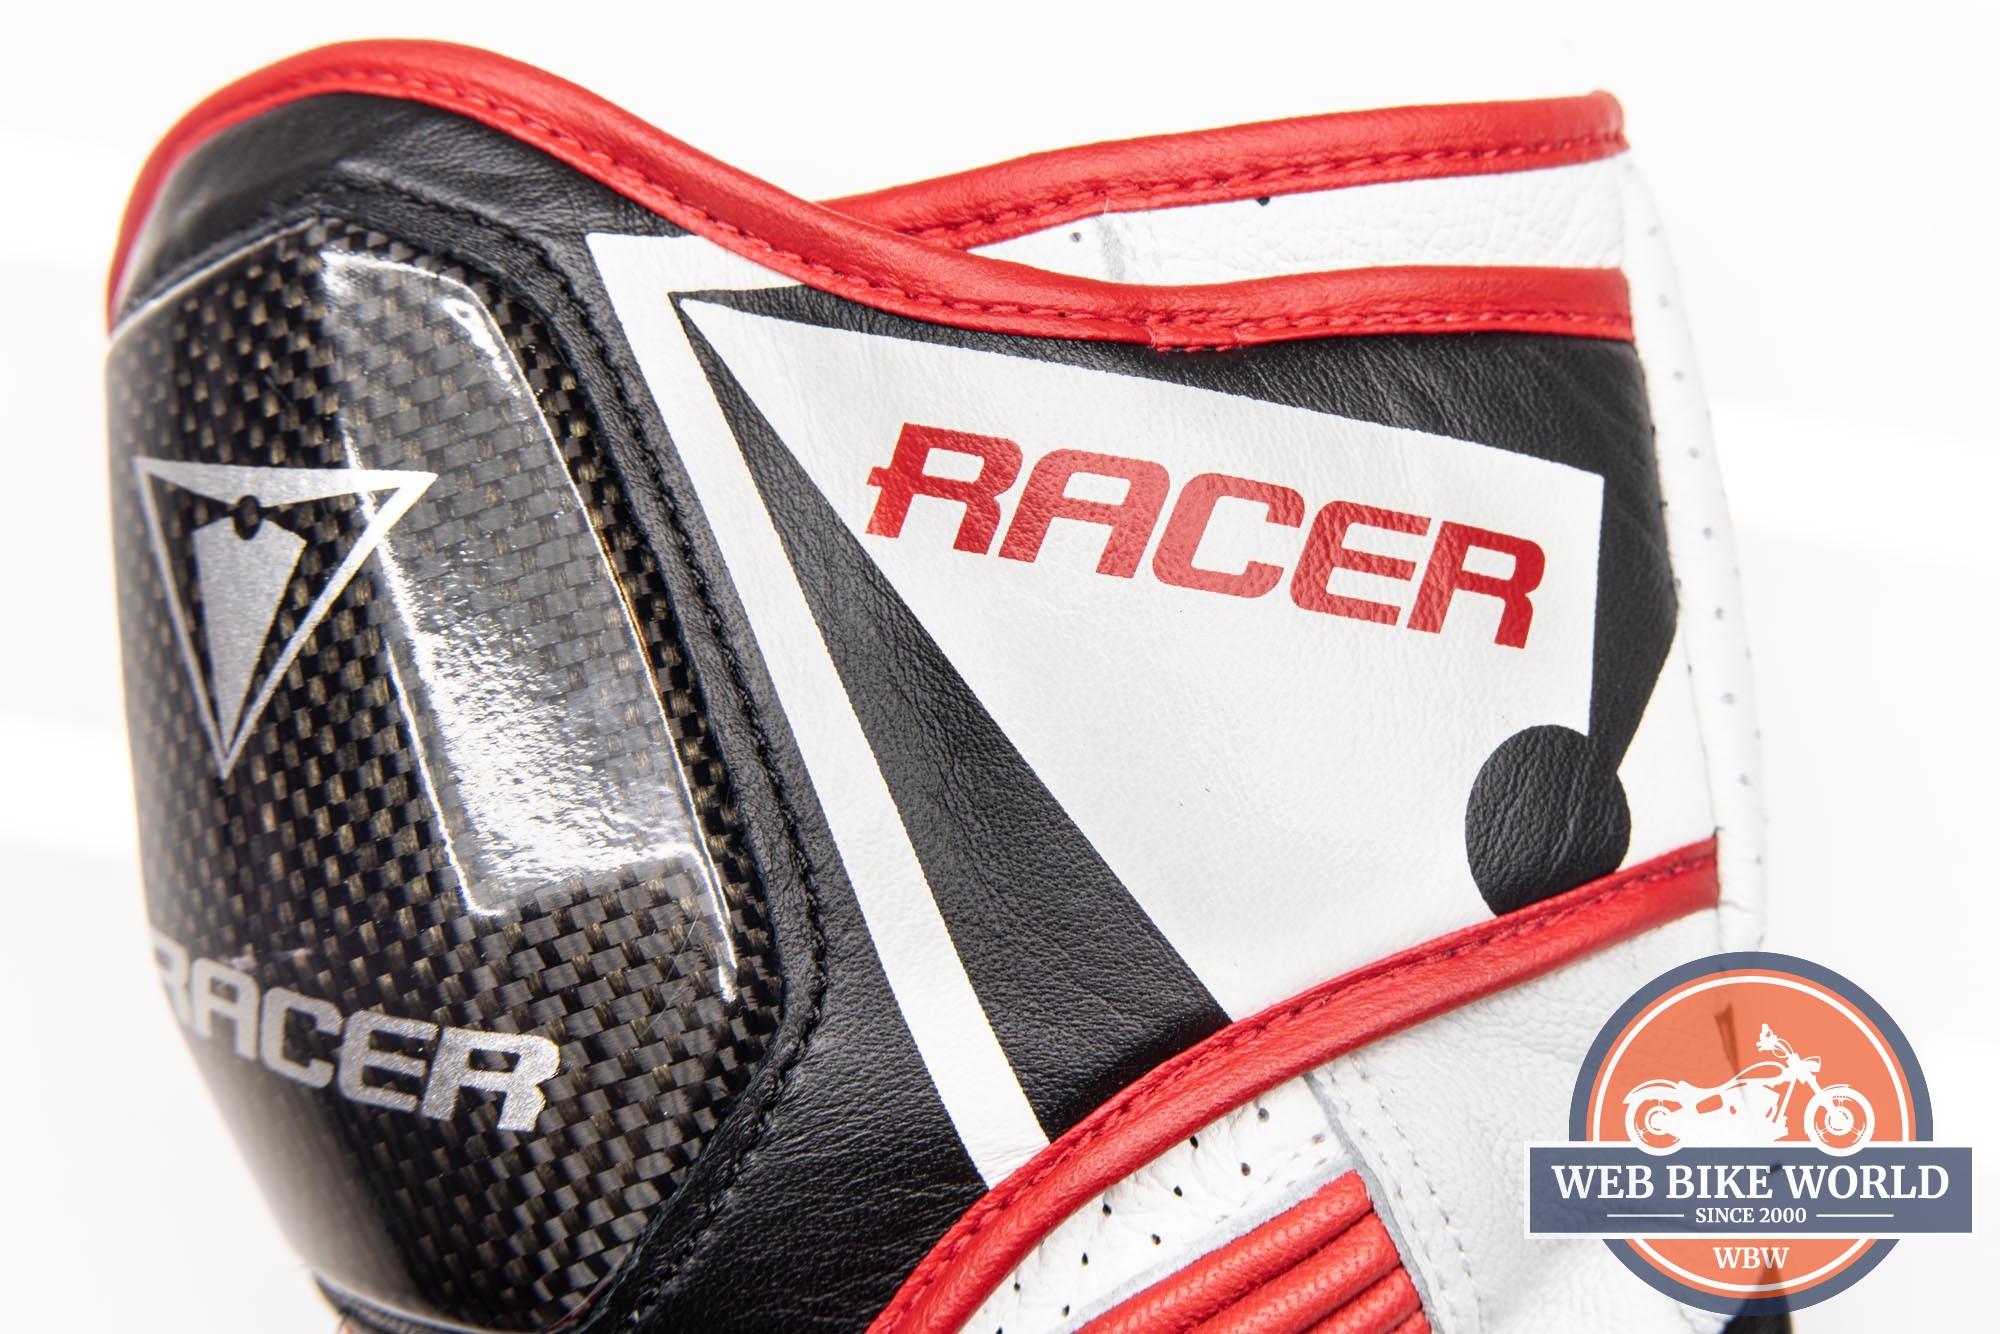 Racer logos on the gauntlet